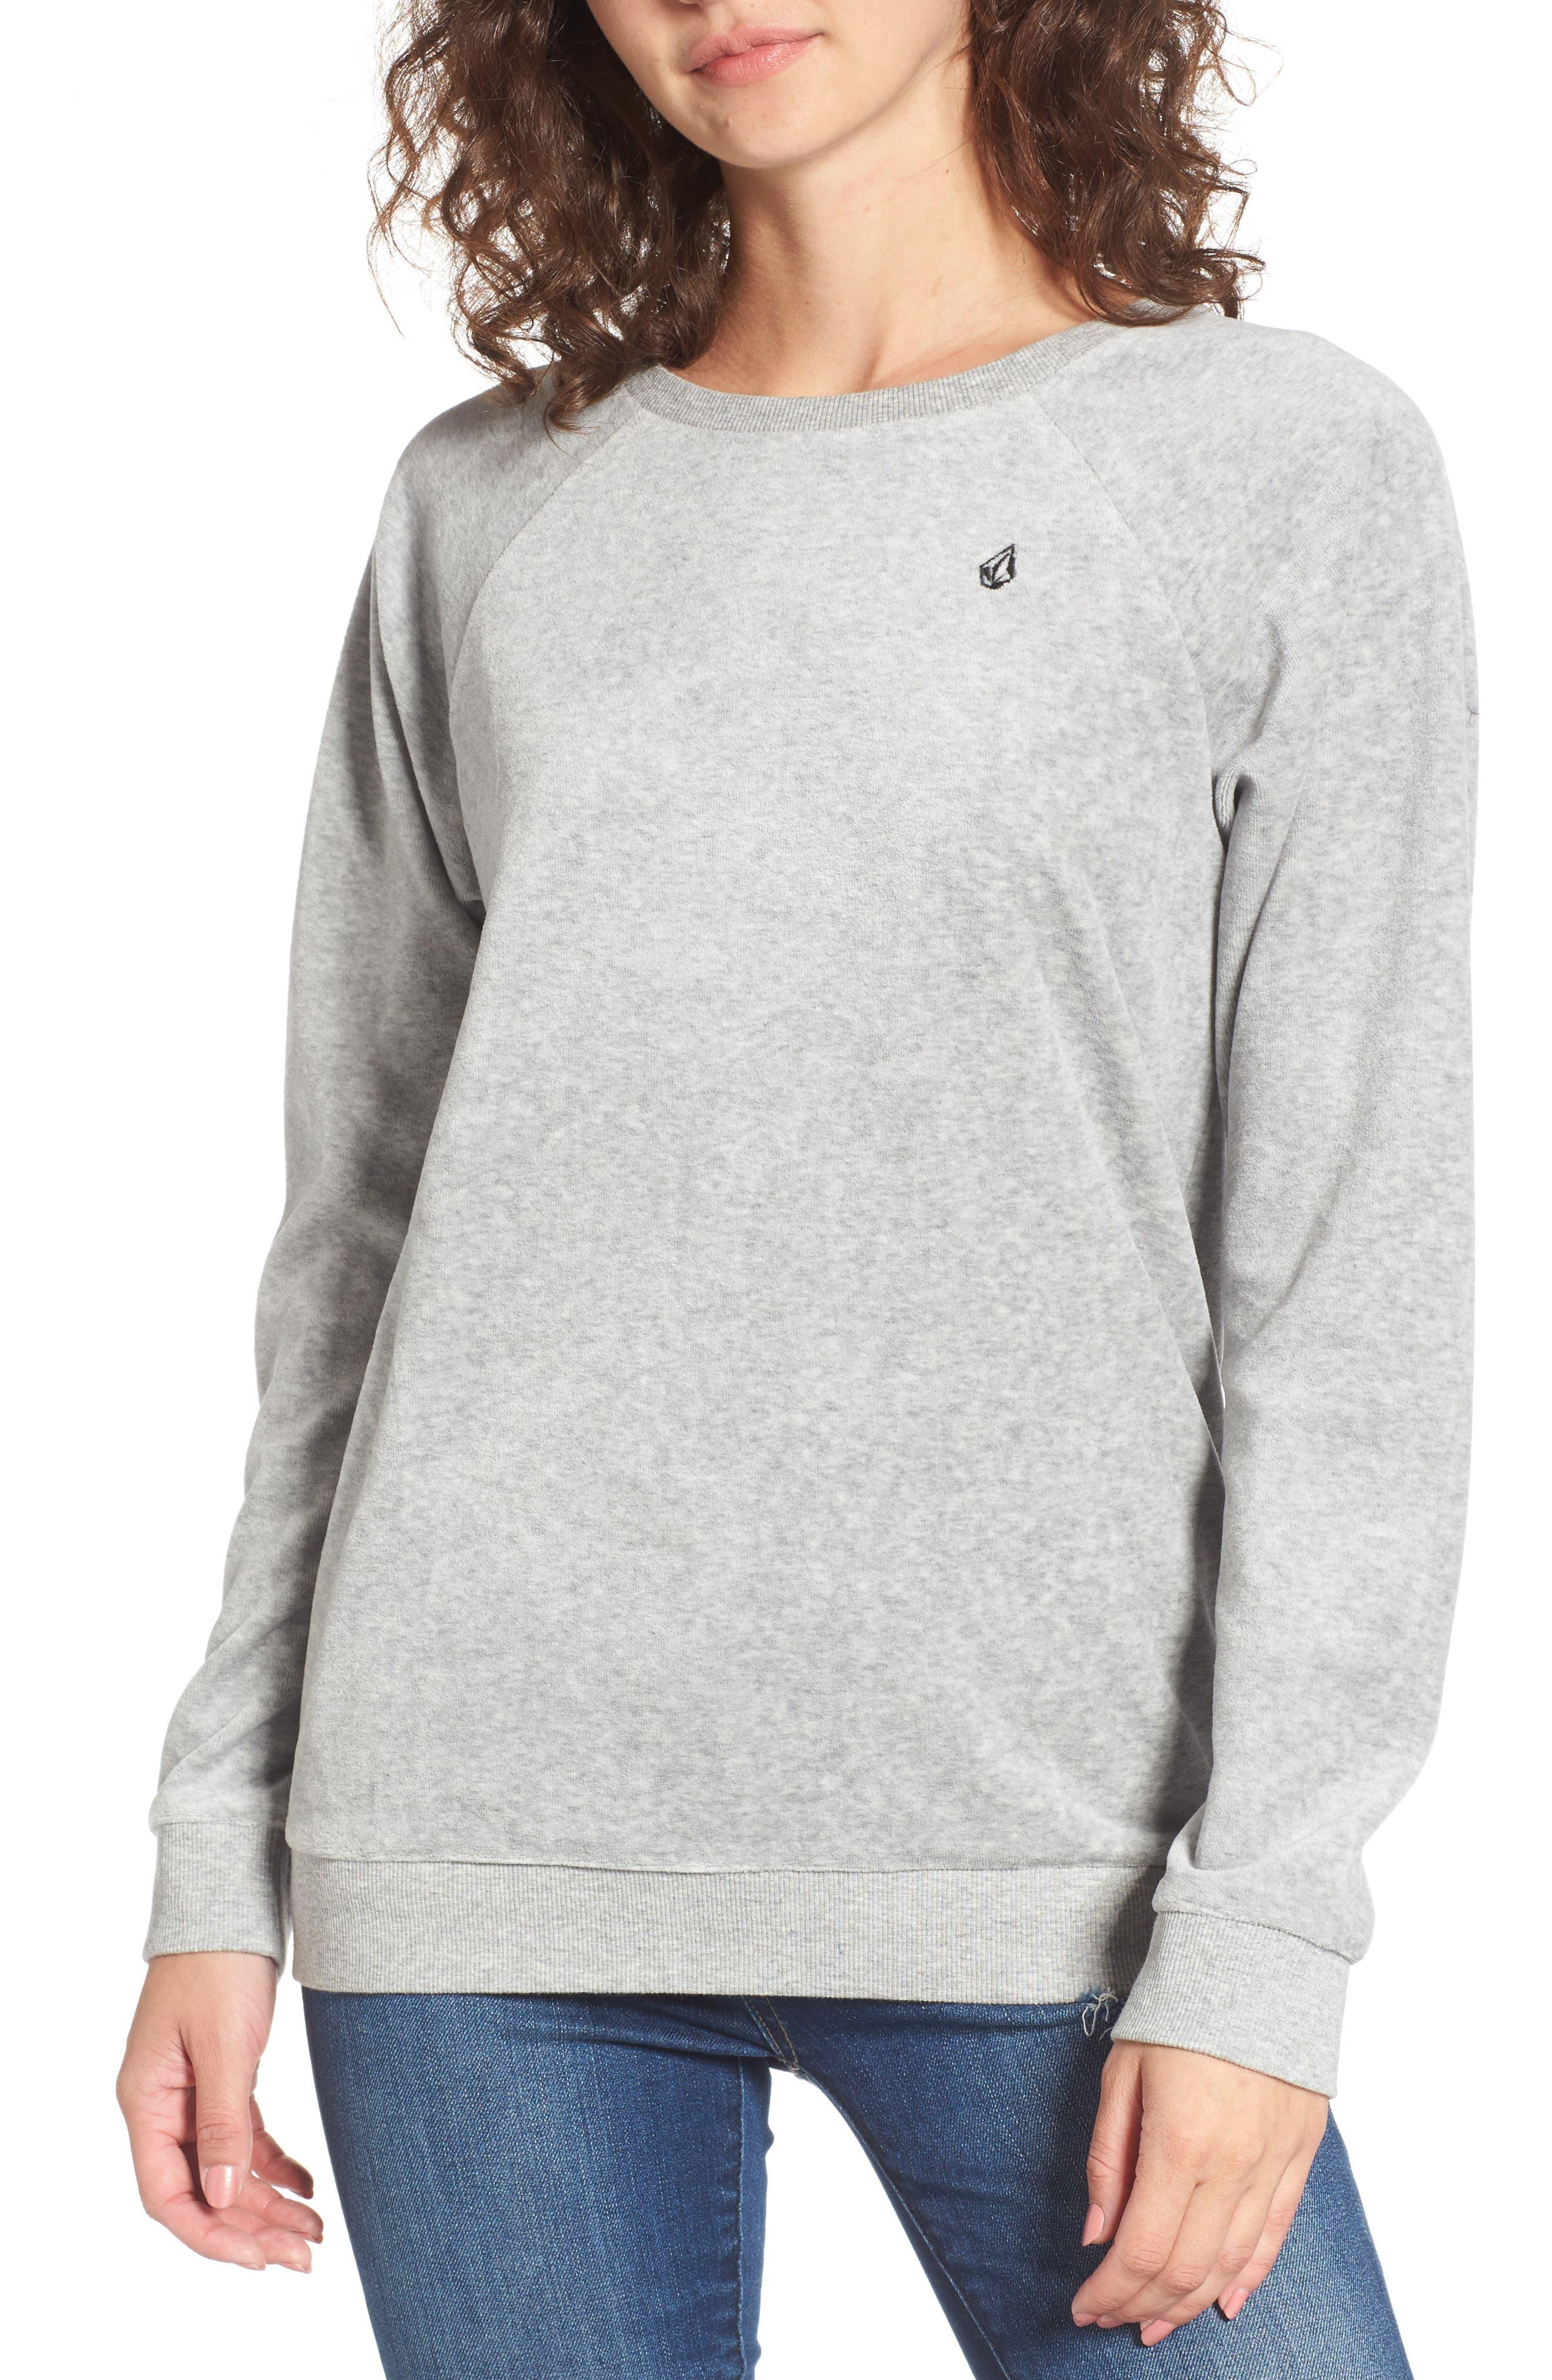 Gotta Crush Raglan Sweatshirt,                         Main,                         color, 035